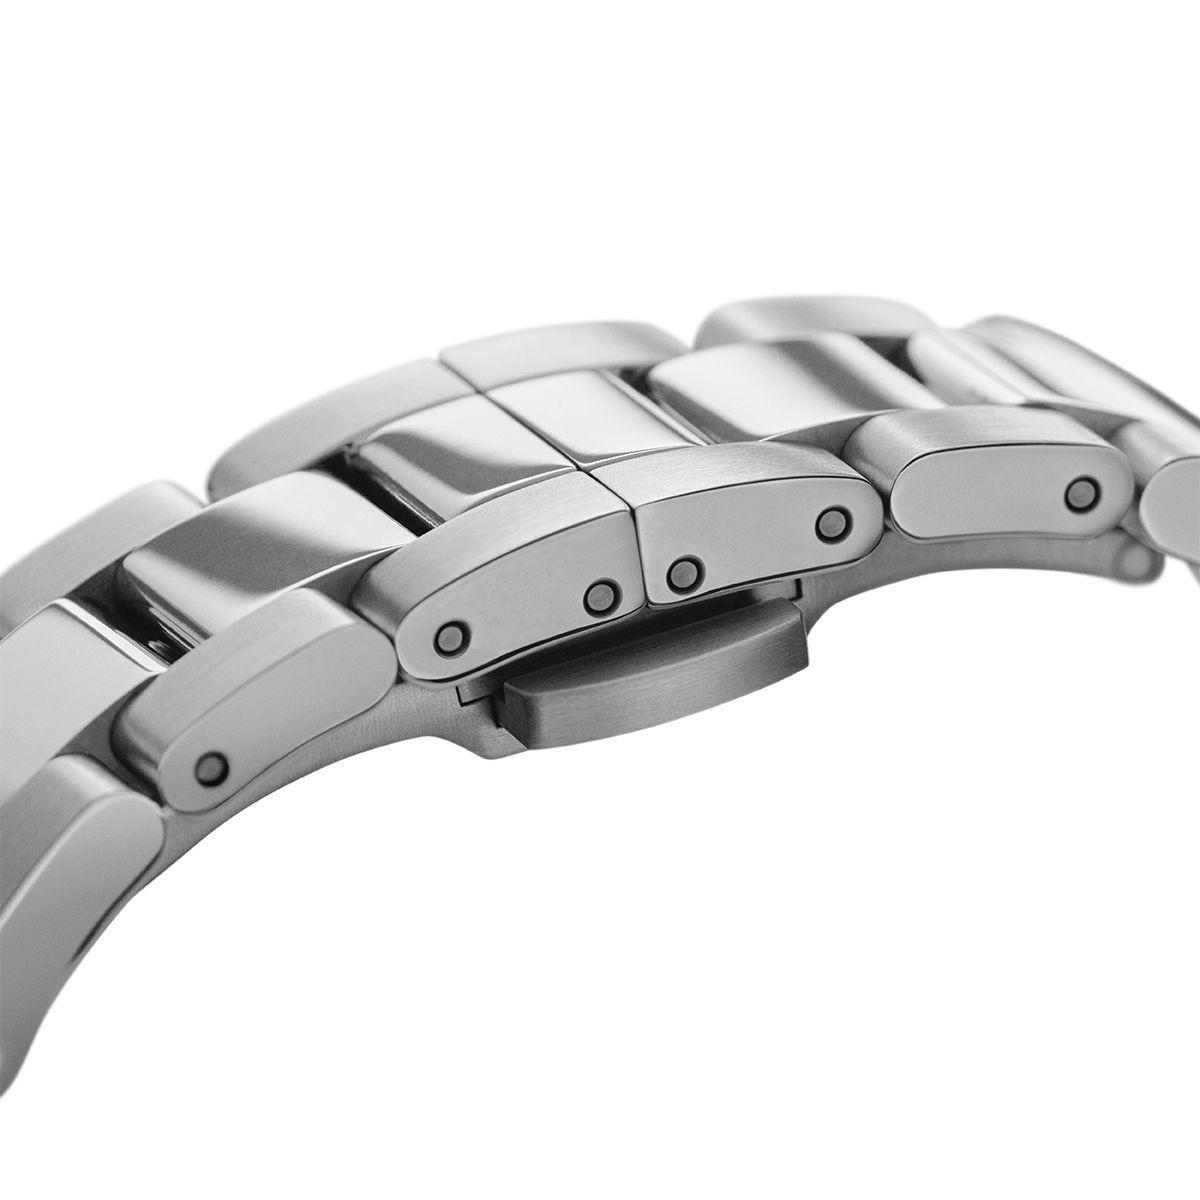 dw官网 dw手表官网 dw中国官网 dw官方旗舰店 DW DW官网  Watch Iconic Black Link Silver 28mm